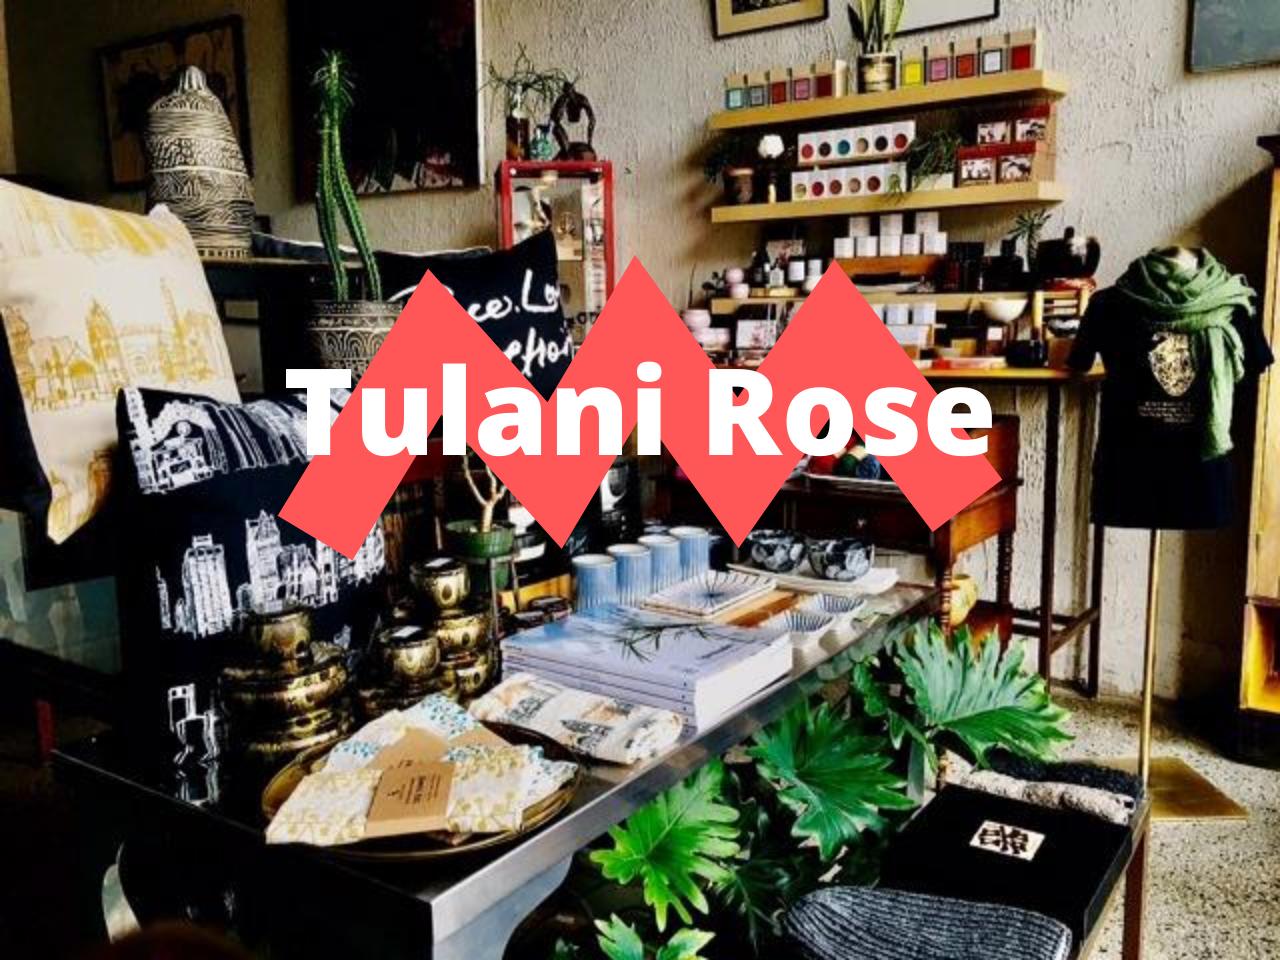 Tulani Rose